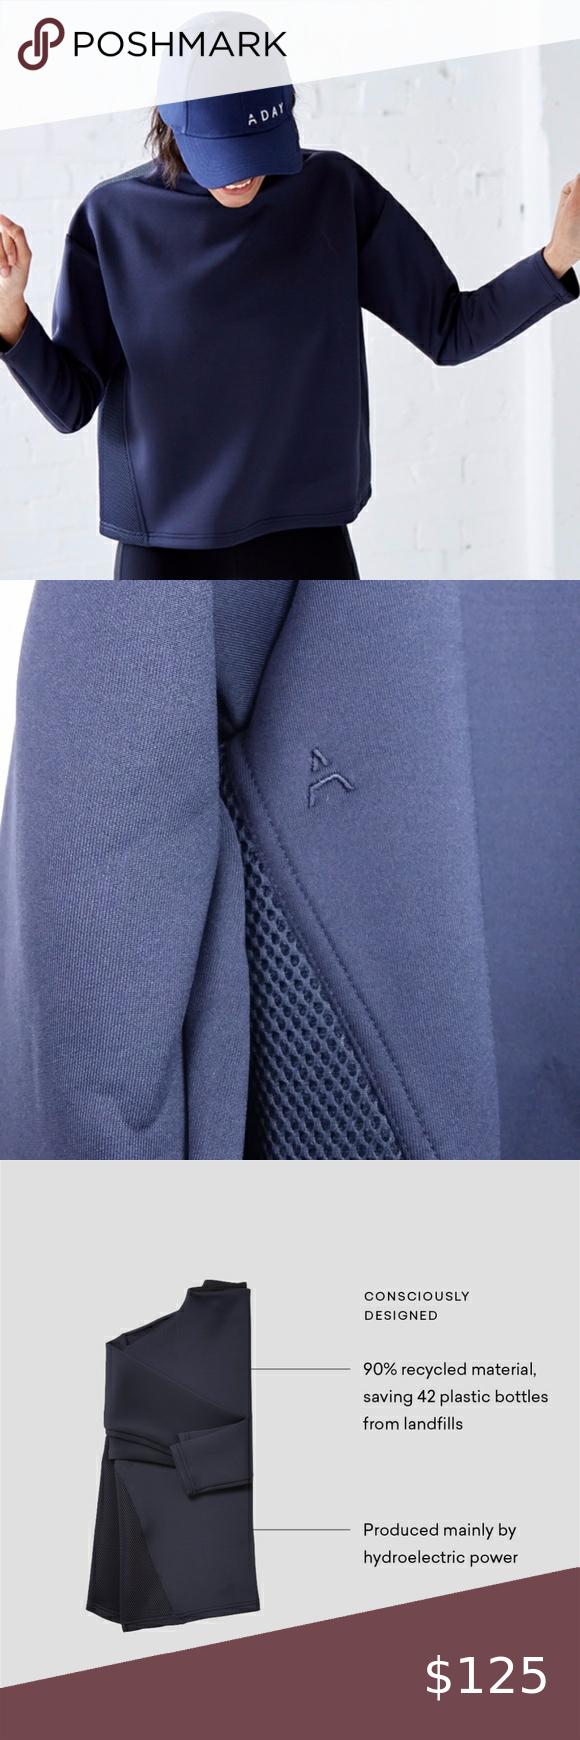 Like A Boss Sweatshirt Navy With Mesh L Sweatshirts Clothes Design Women Shopping [ 1740 x 580 Pixel ]